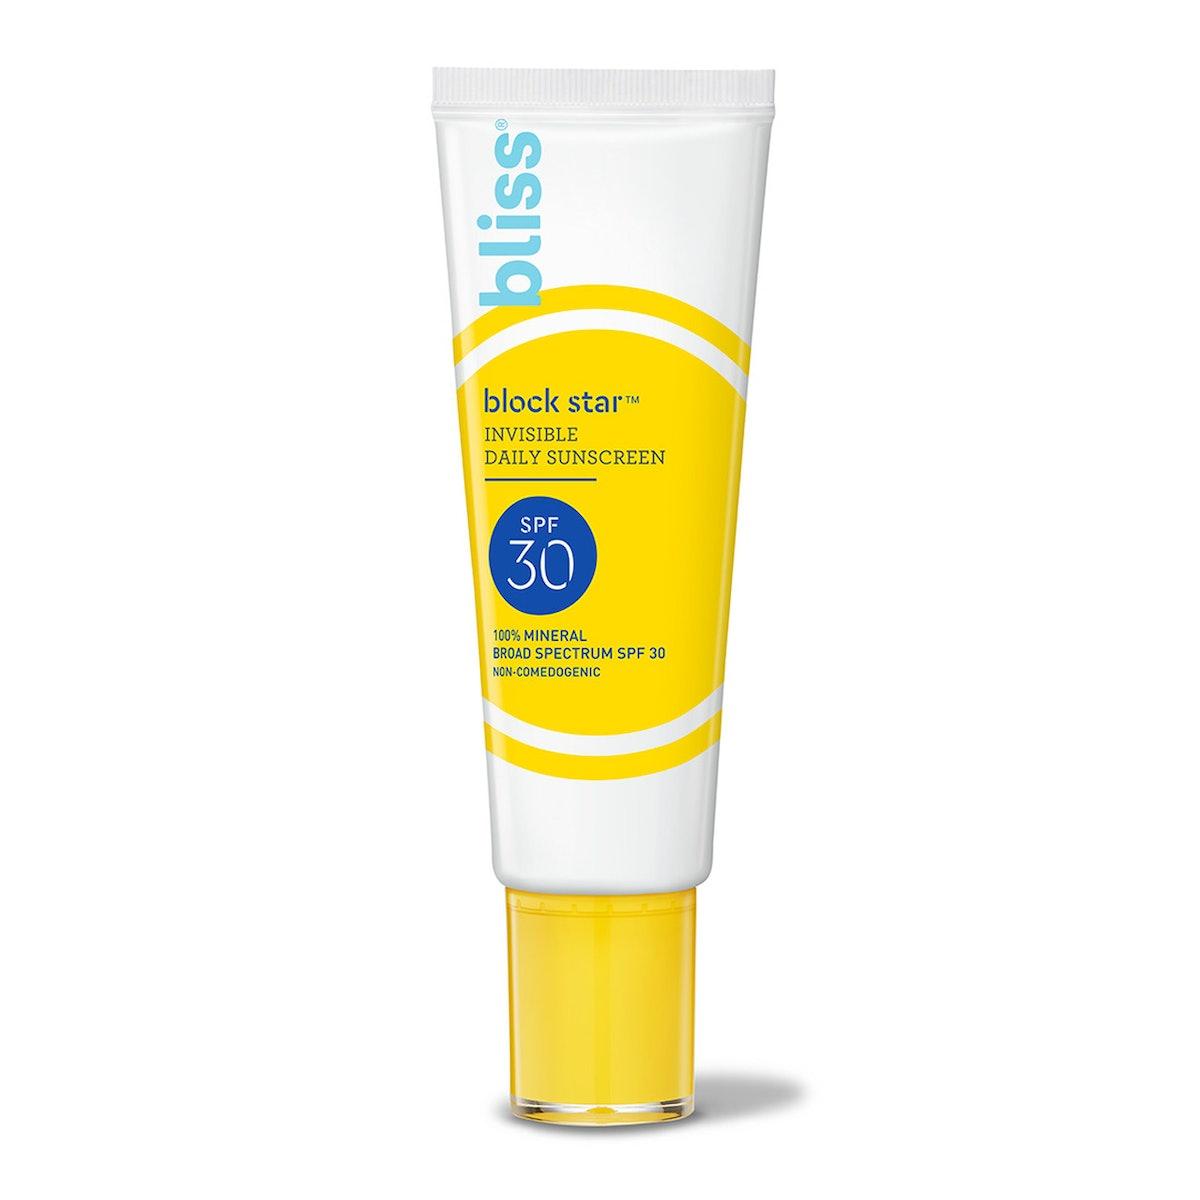 Block Star Invisible Daily Sunscreen SPF 30